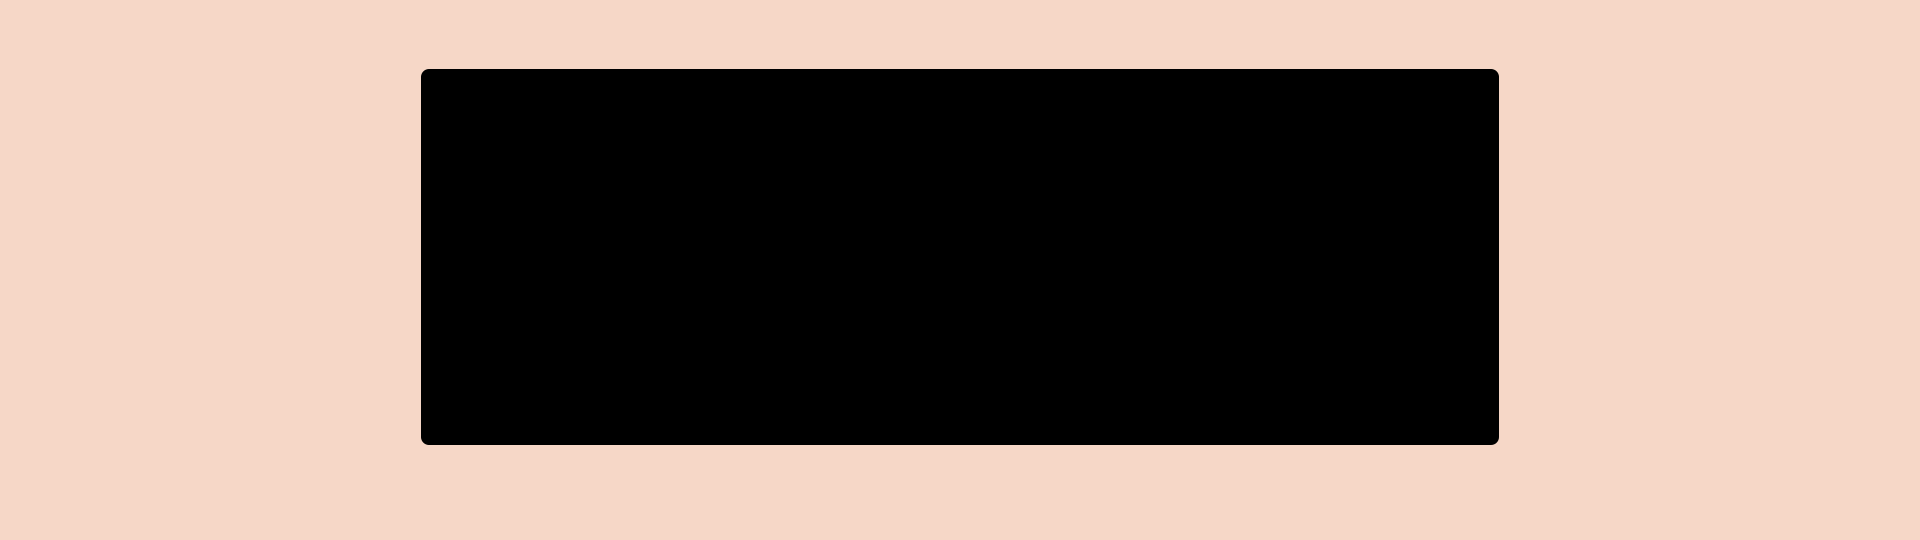 CATEGORY-SDA-EVDEBAKIMEPILATORIPL10INDIRIM-03-08